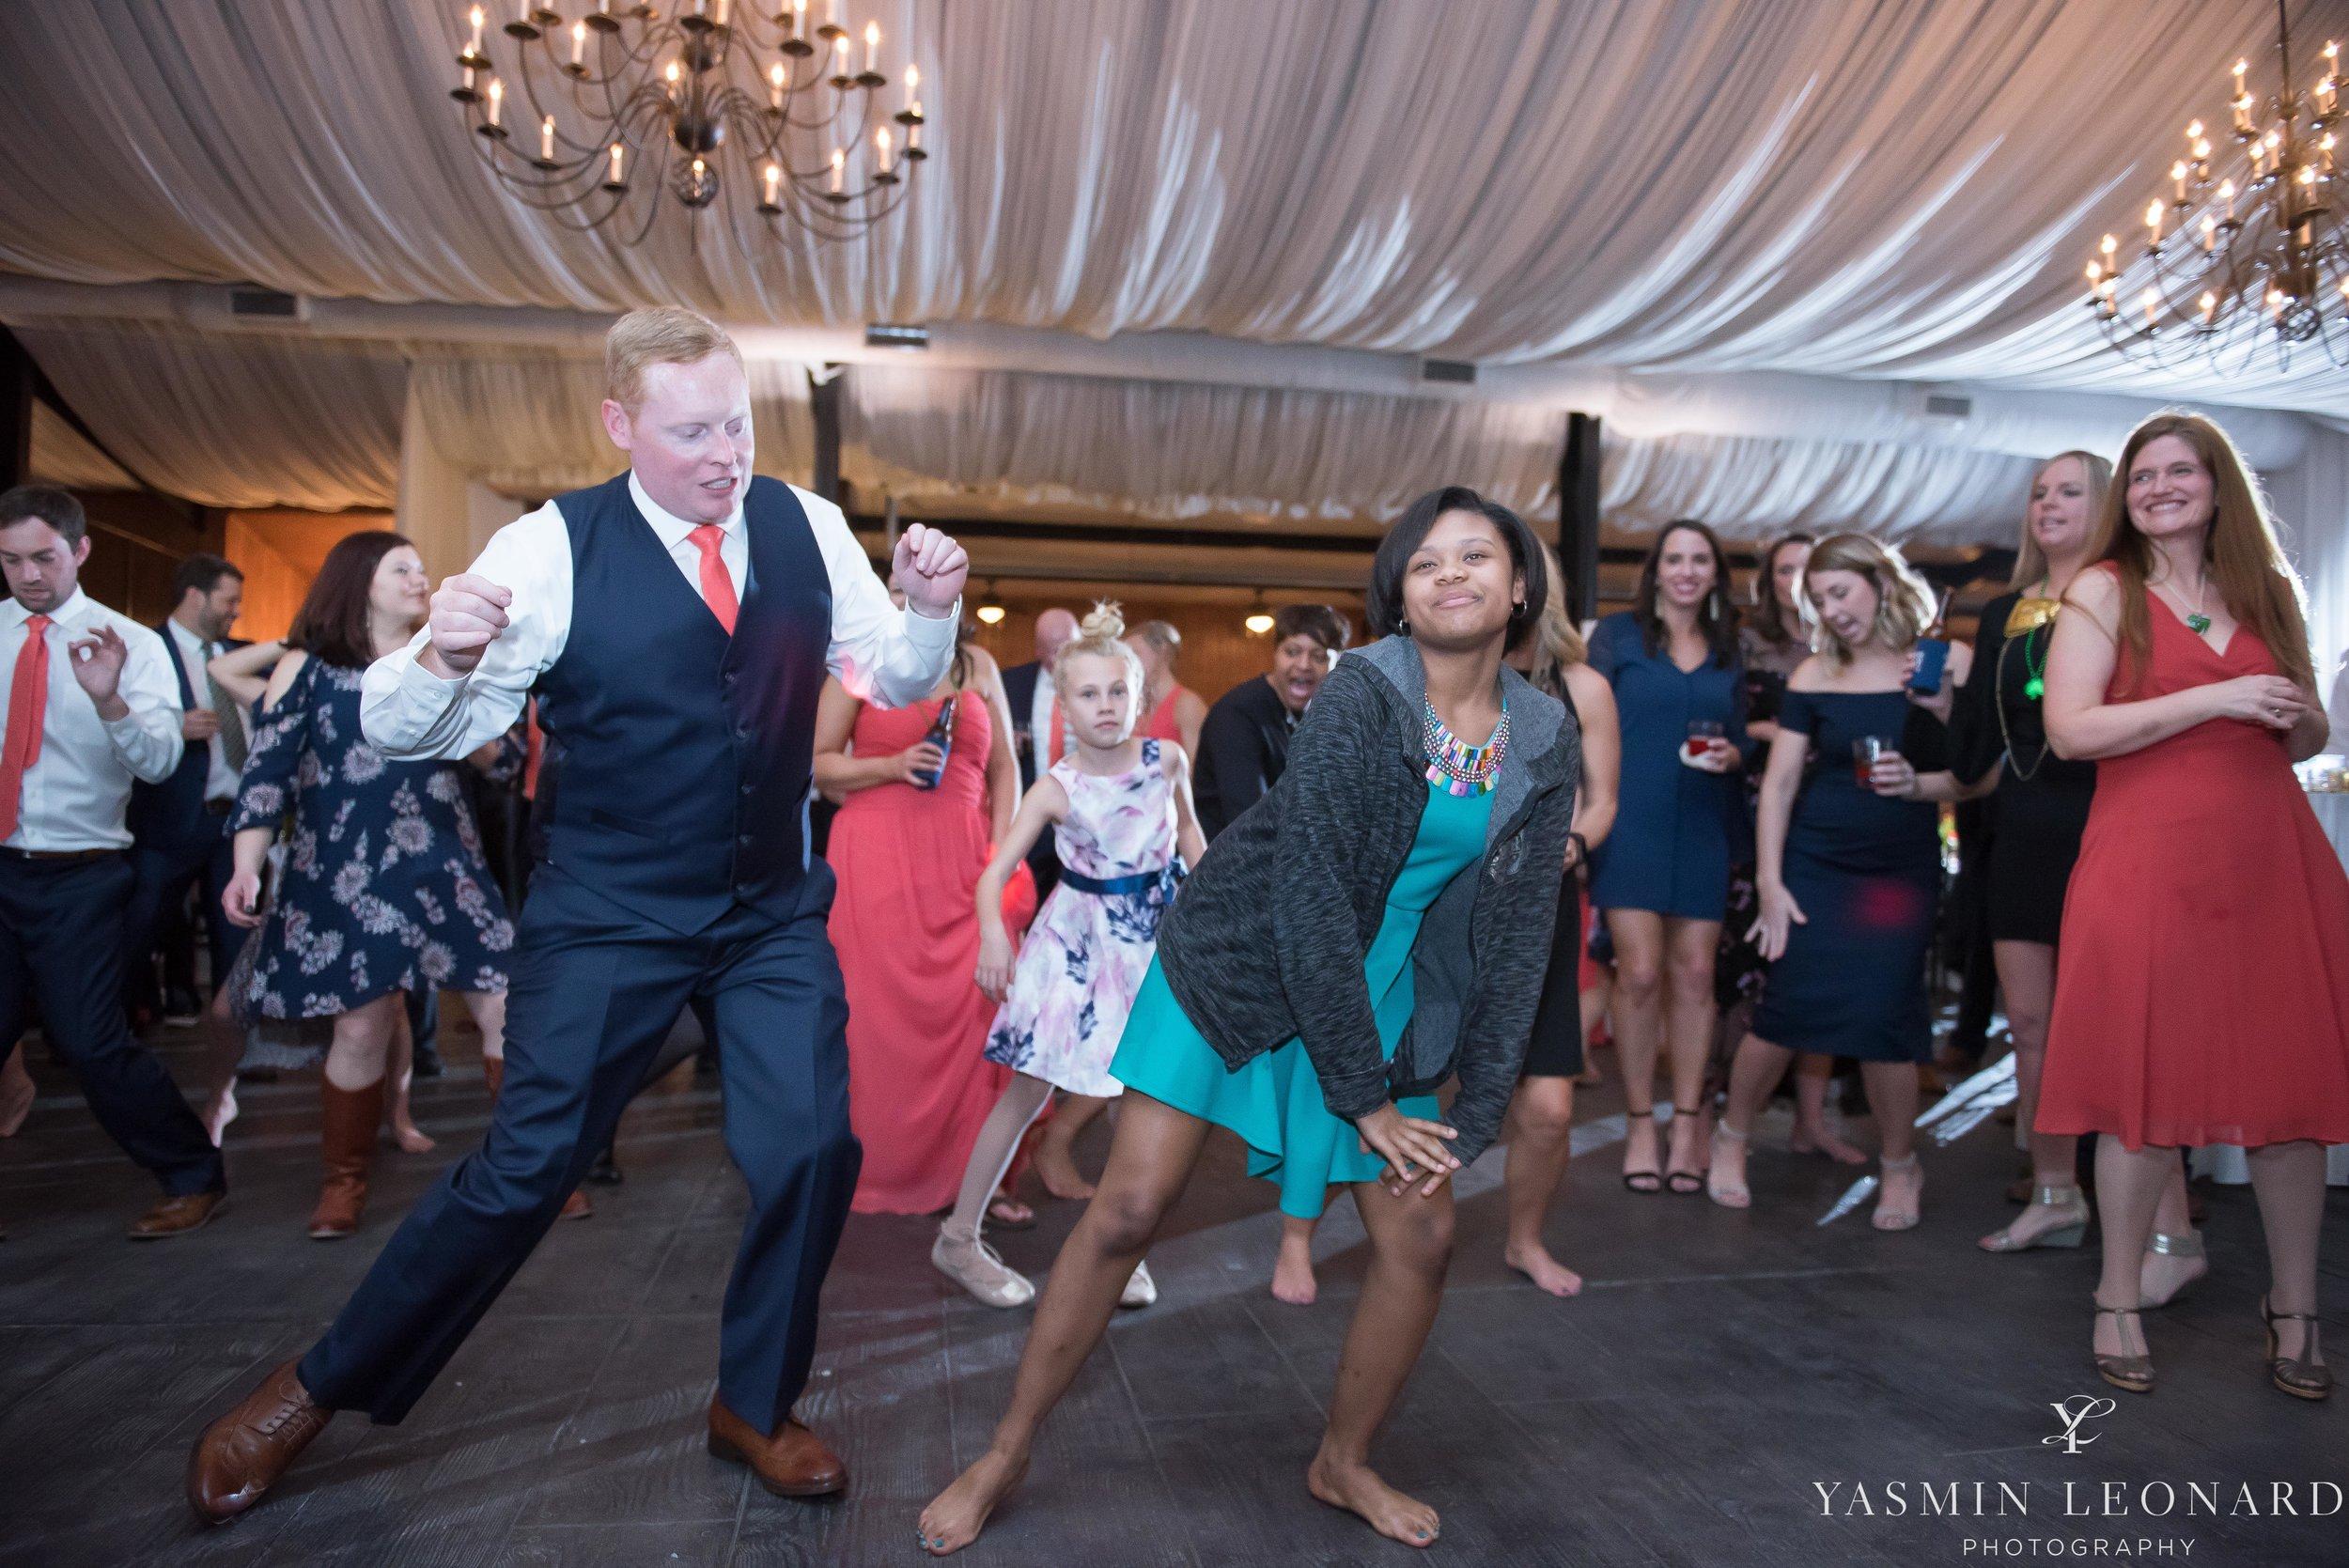 Adaumont Farm - Adaumont Farm Weddings - Trinity Weddings - NC Weddings - Yasmin Leonard Photography-100.jpg